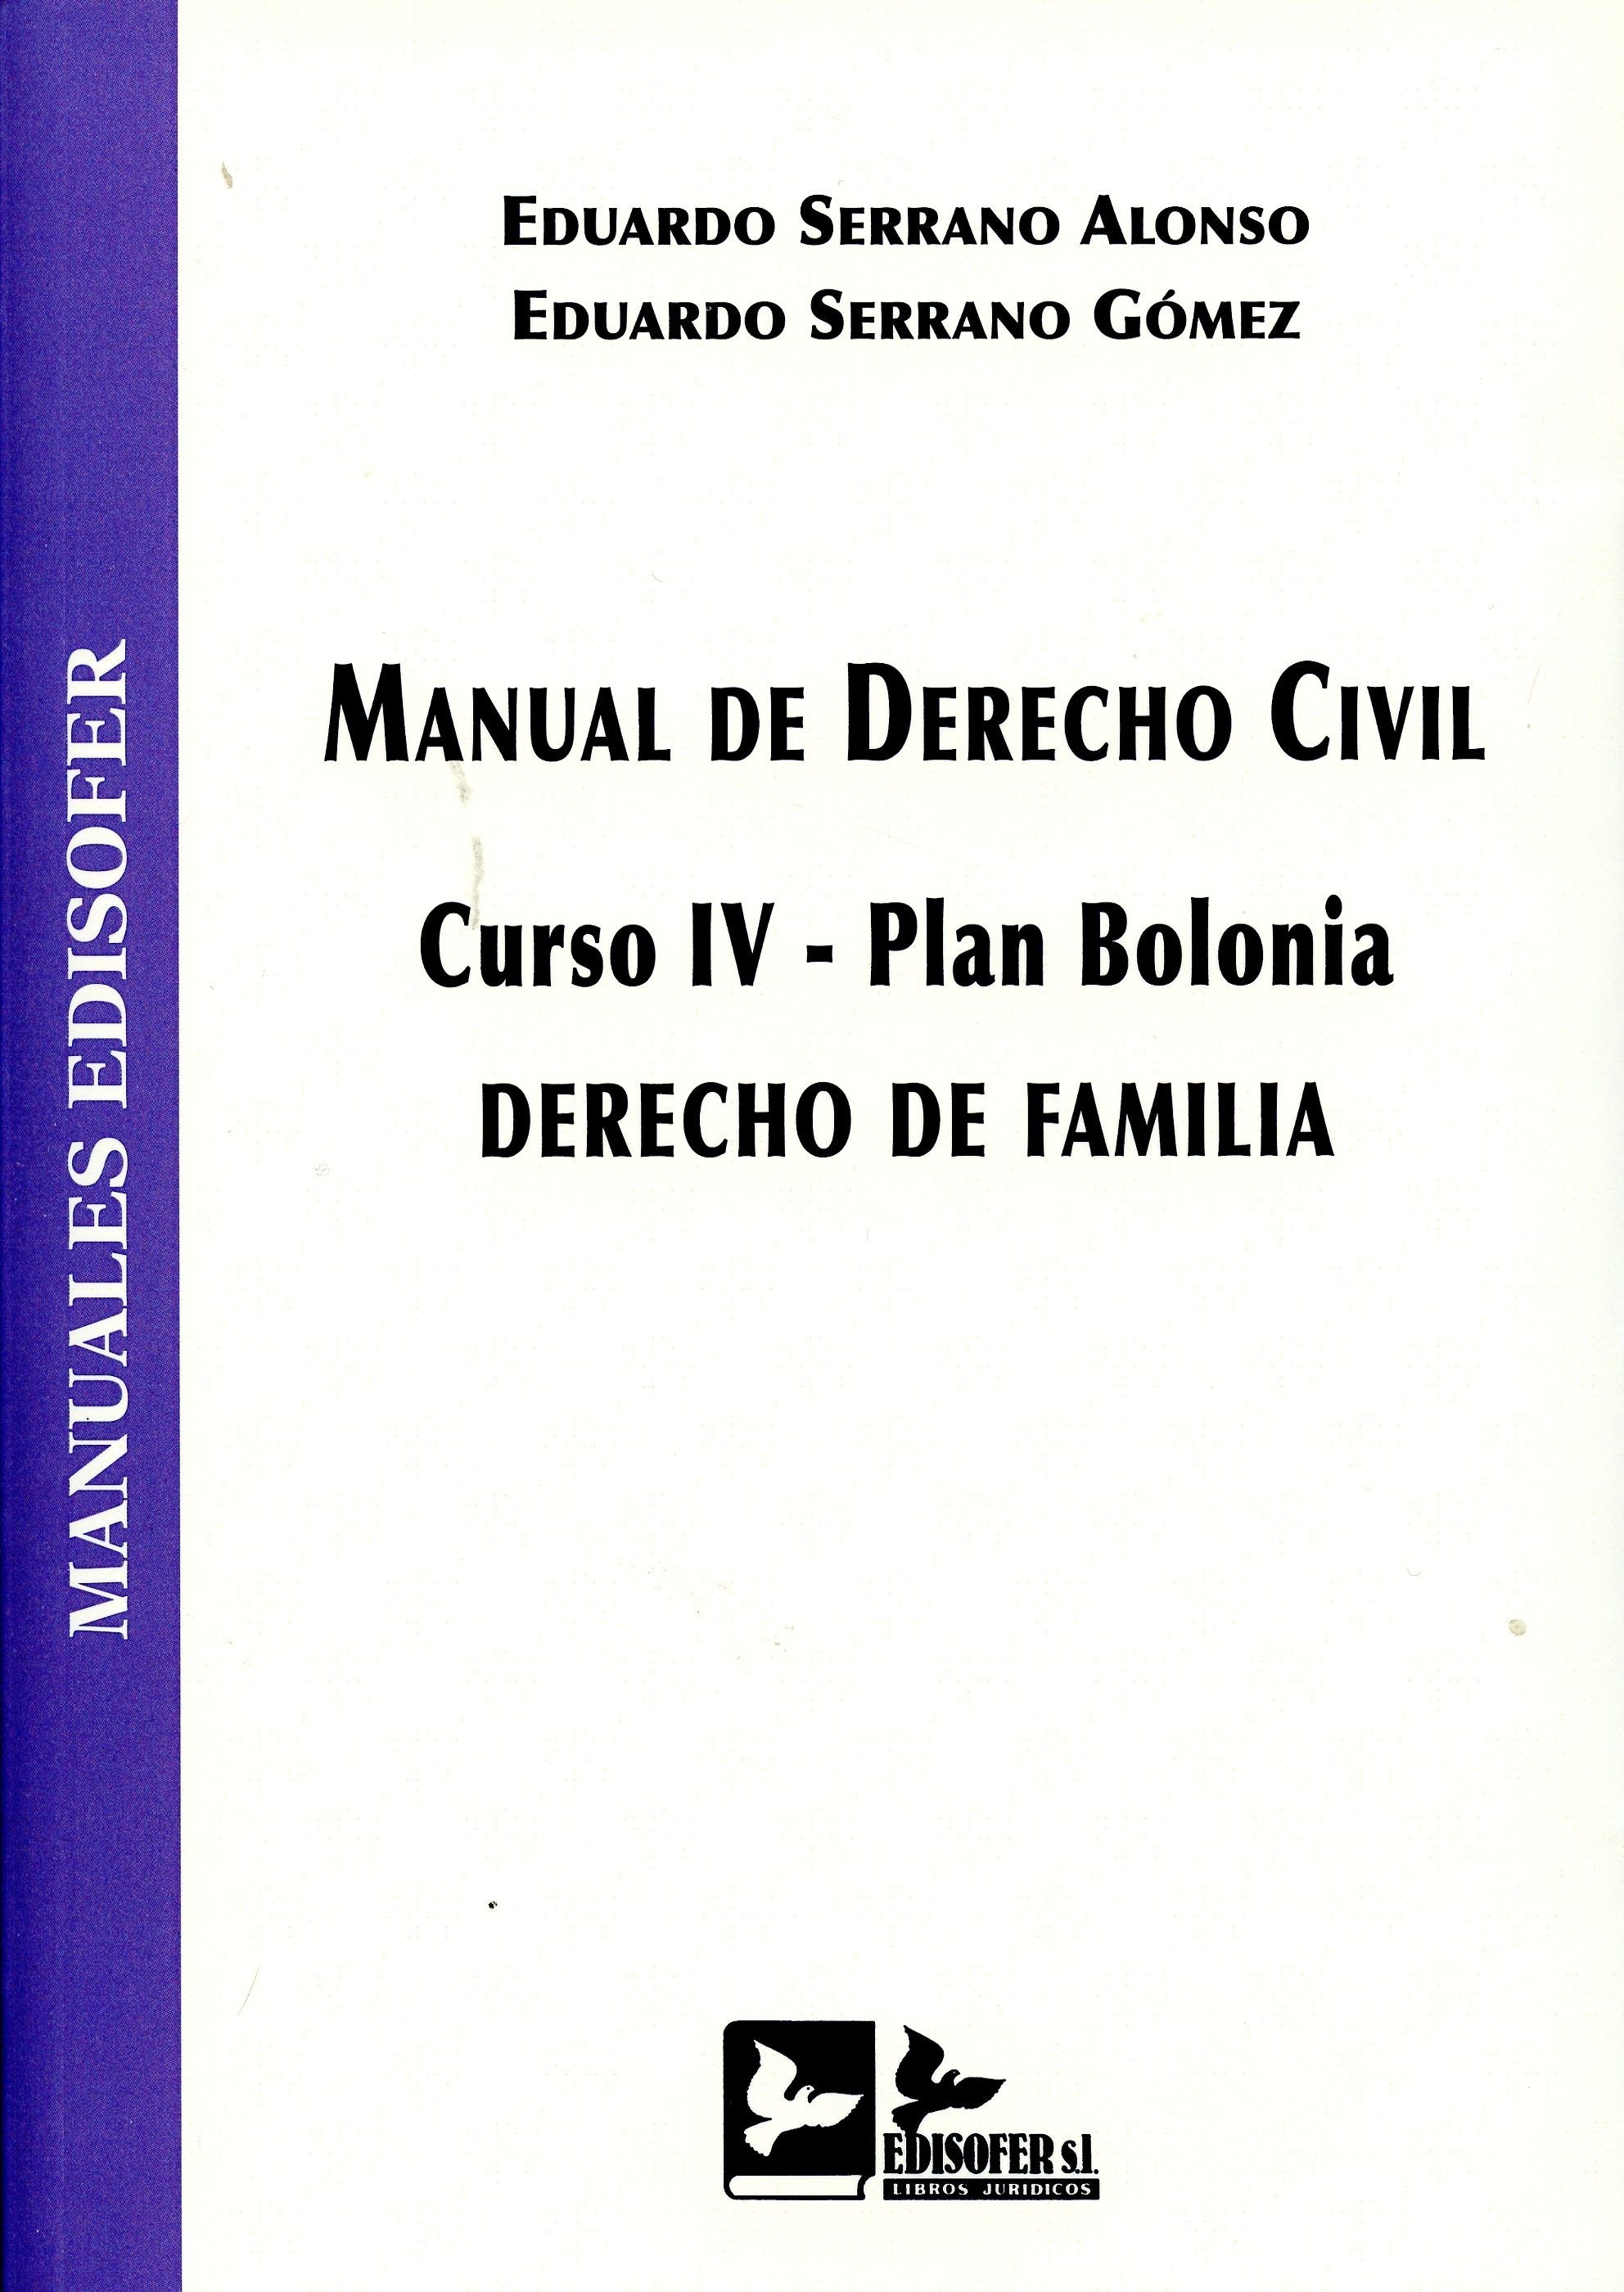 manual de derecho civil. curso iv-plan bolonia. derecho de familia-eduardo serrano alonso-9788415276456